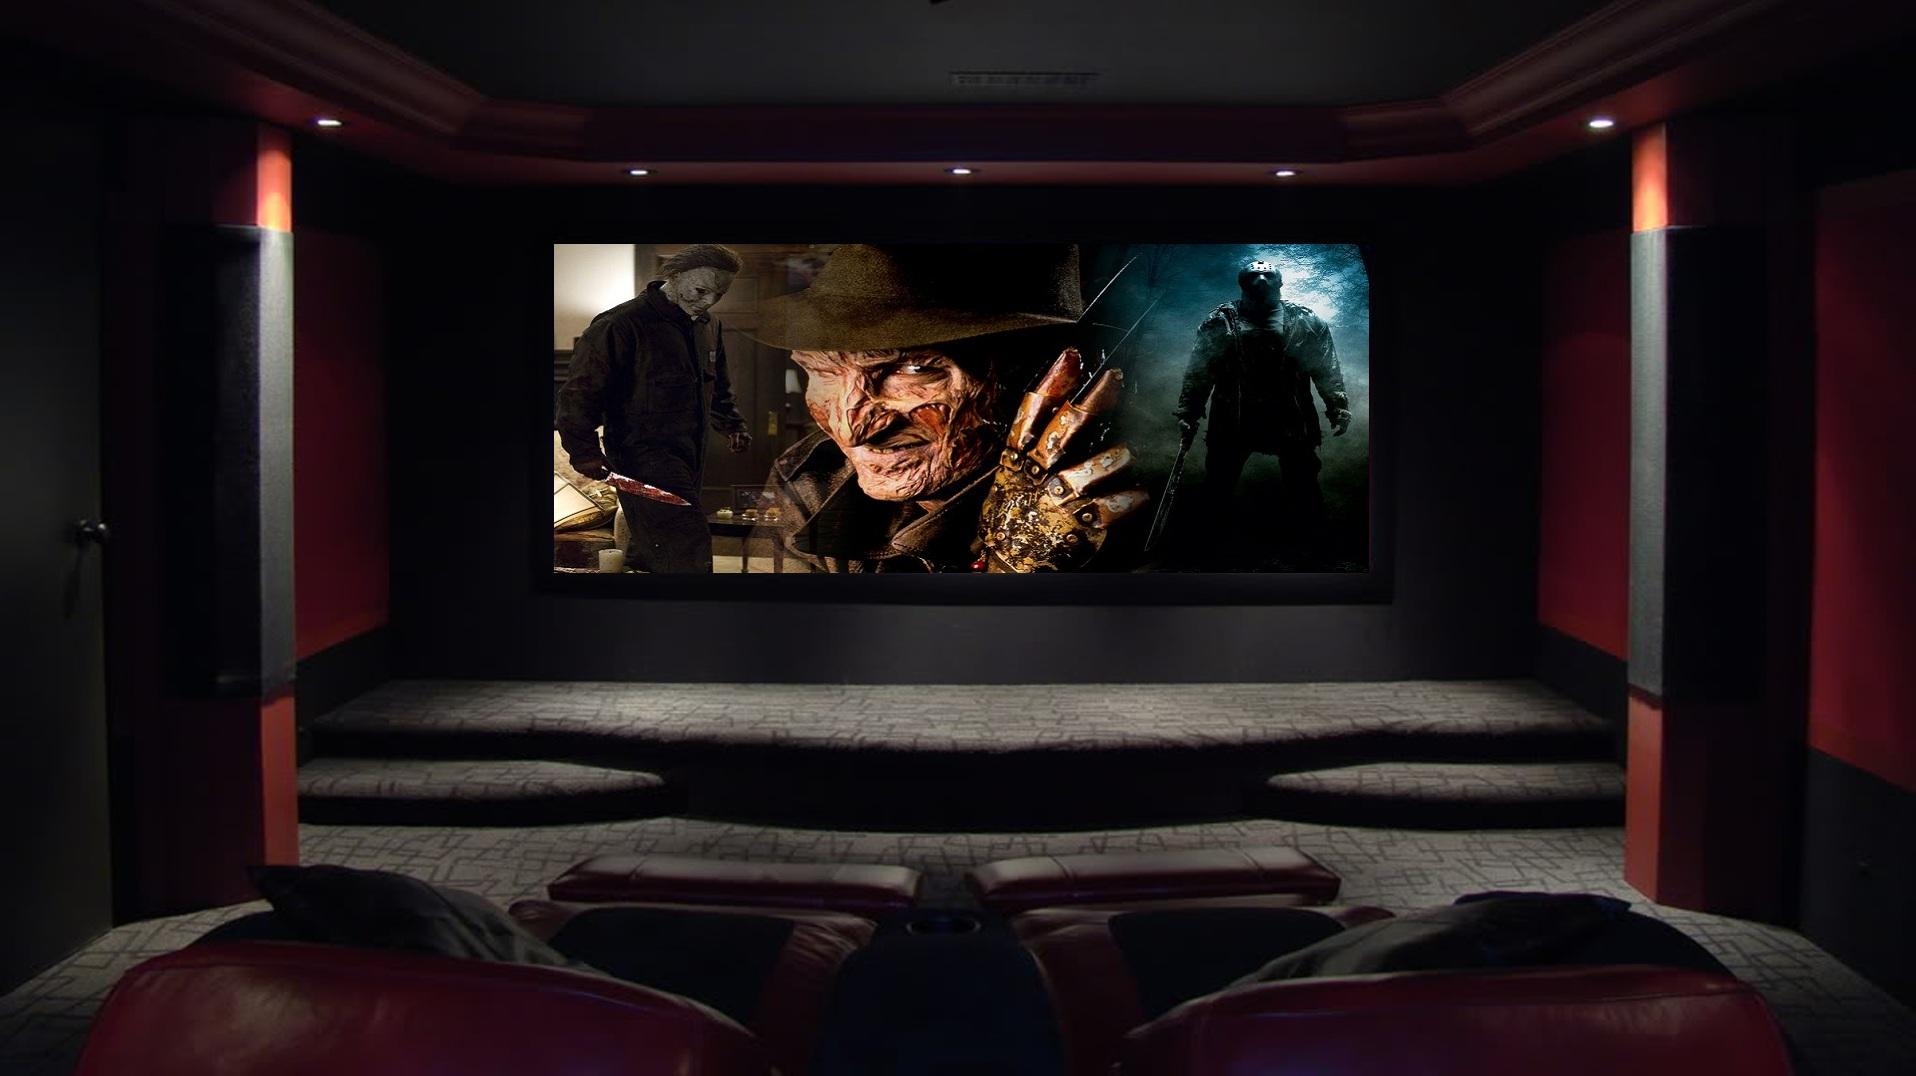 HD Theater Room.jpg